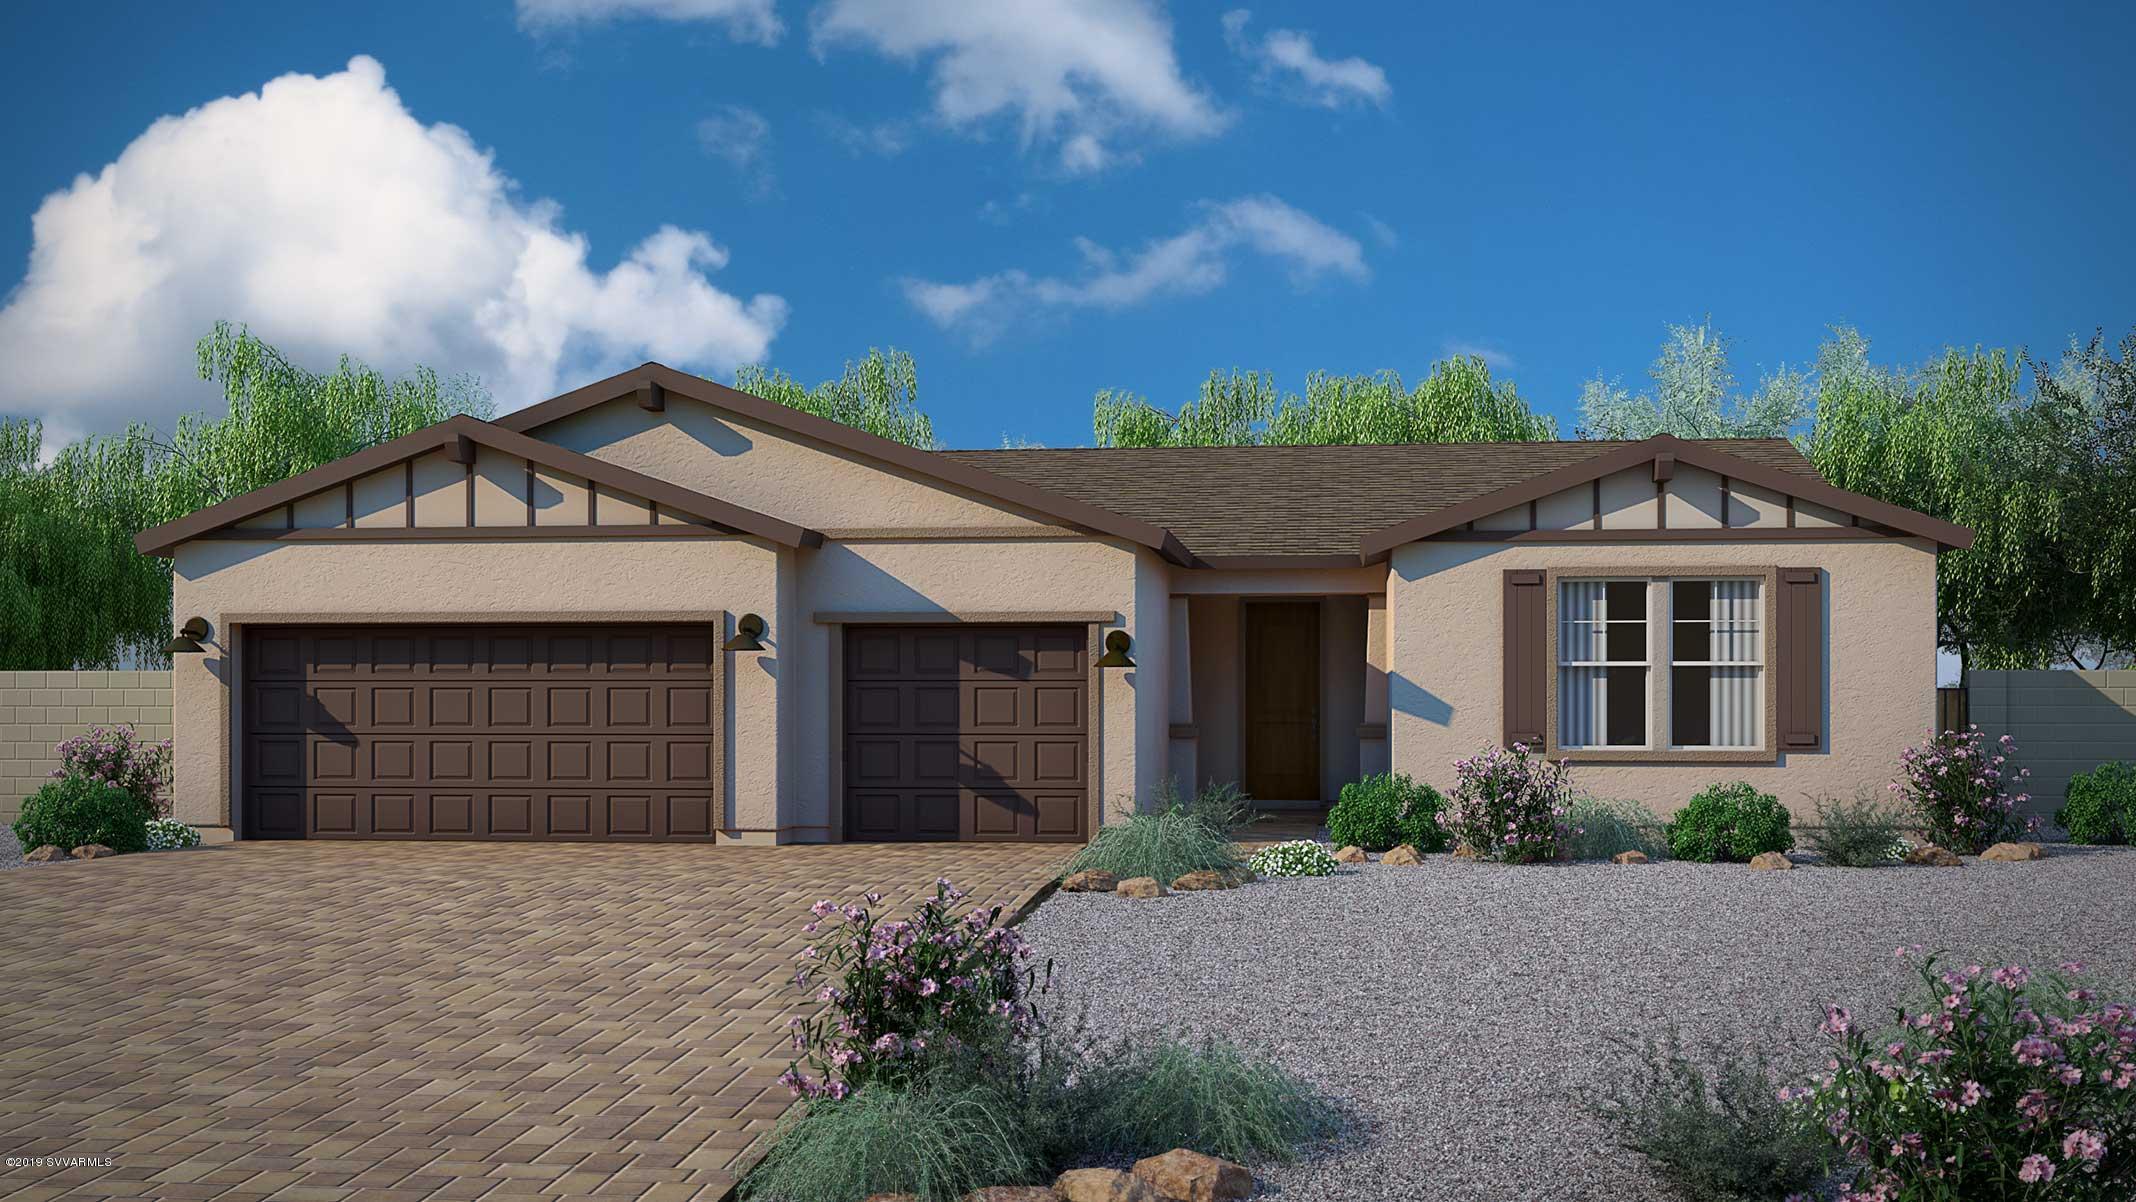 450 Marion Circle Clarkdale, AZ 86324